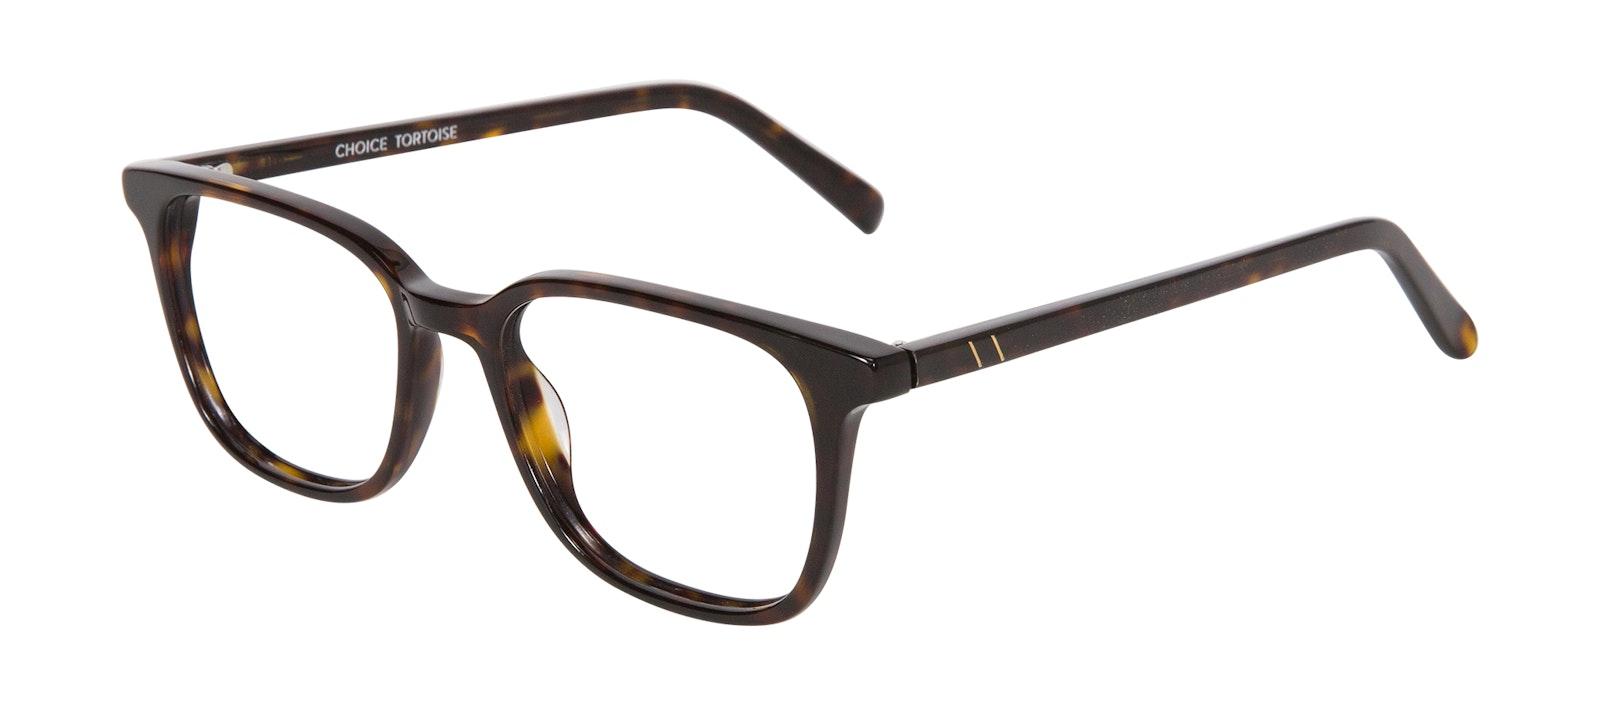 Affordable Fashion Glasses Square Eyeglasses Men Choice Tortoise Tilt